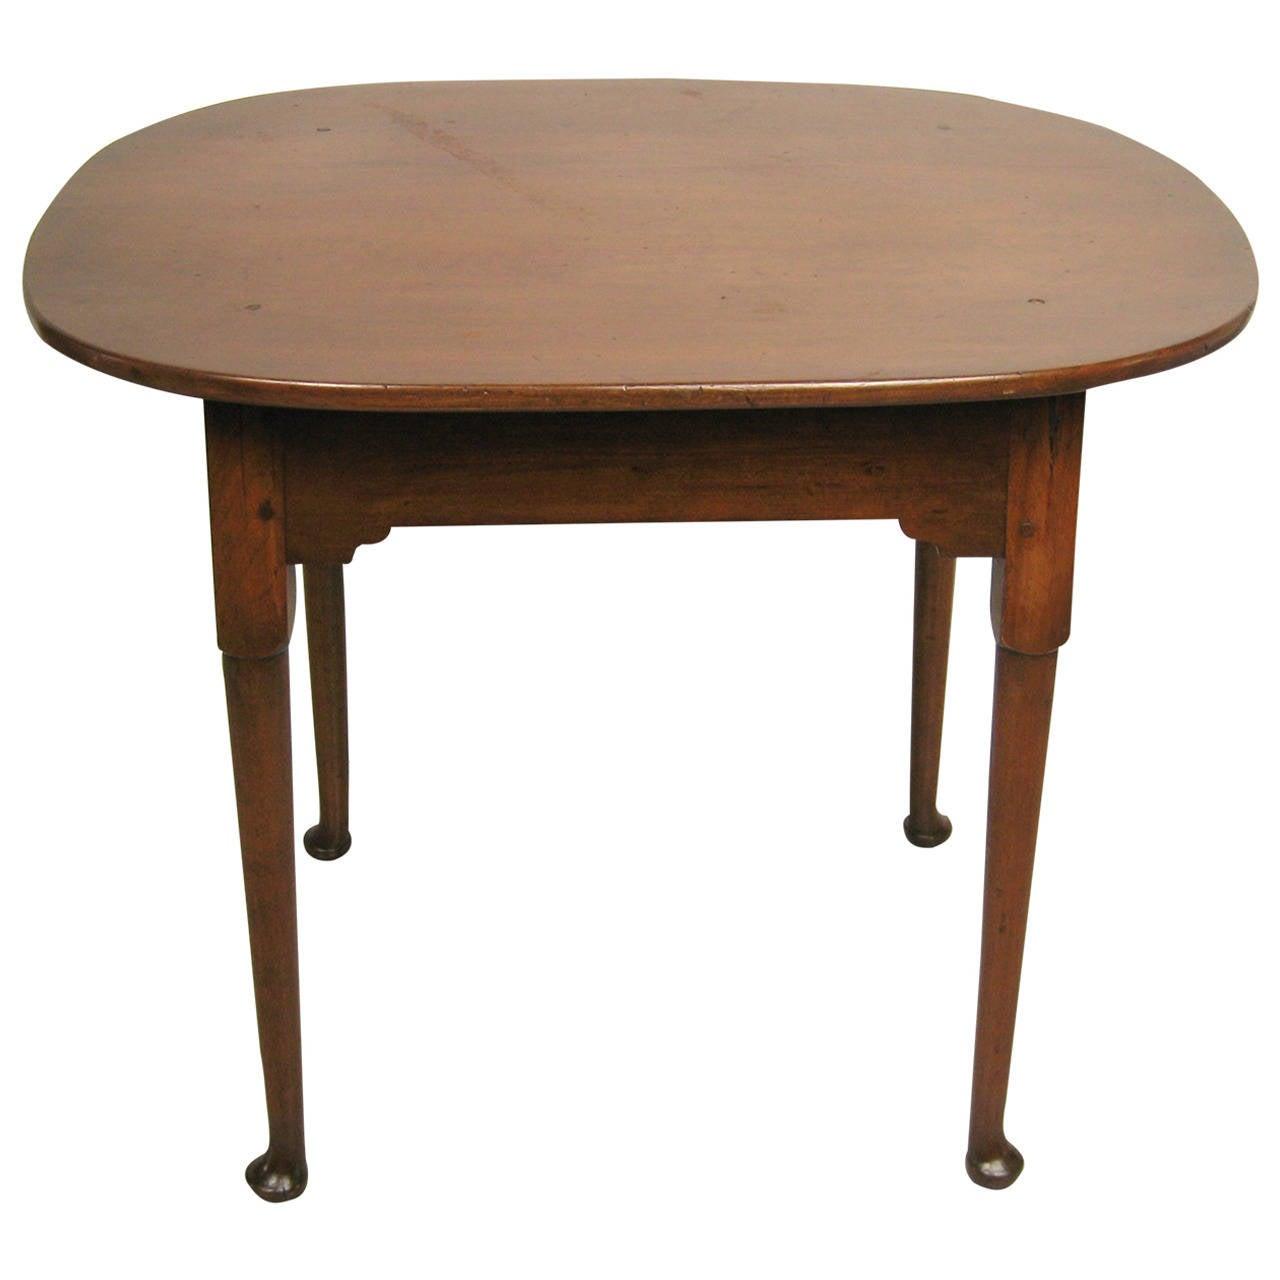 Wonderful 18th Century Queen Anne Table